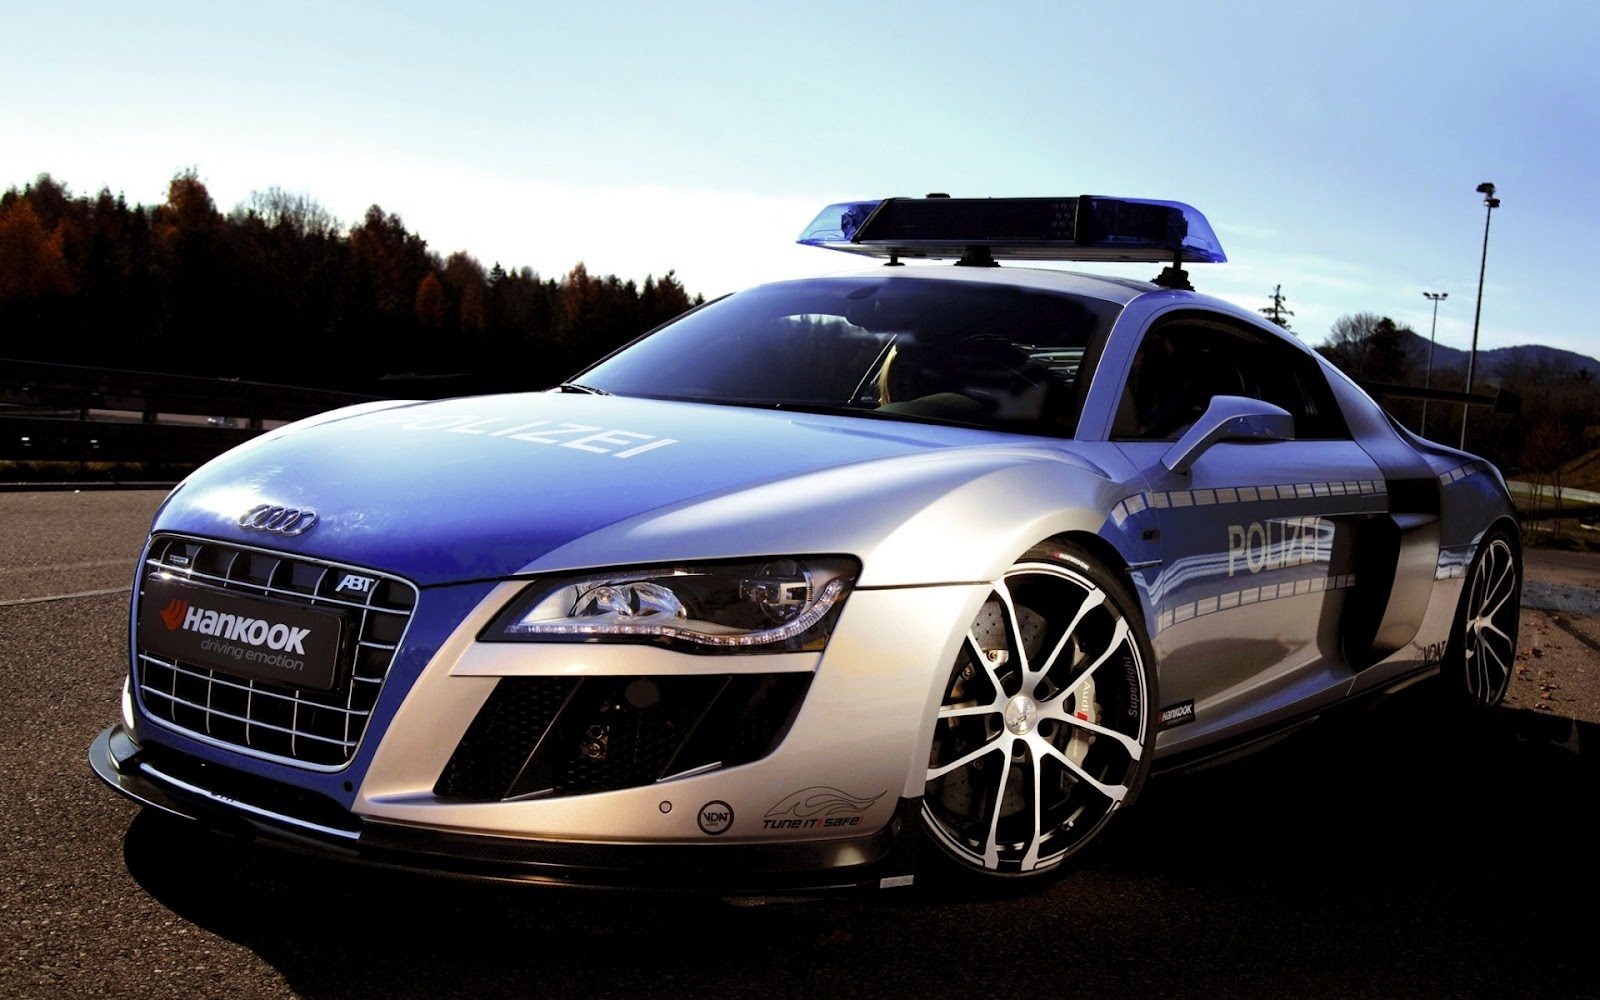 Audi R8 Wallpaper 5946 Hd Wallpapers in Cars   Imagesci 1600x1000